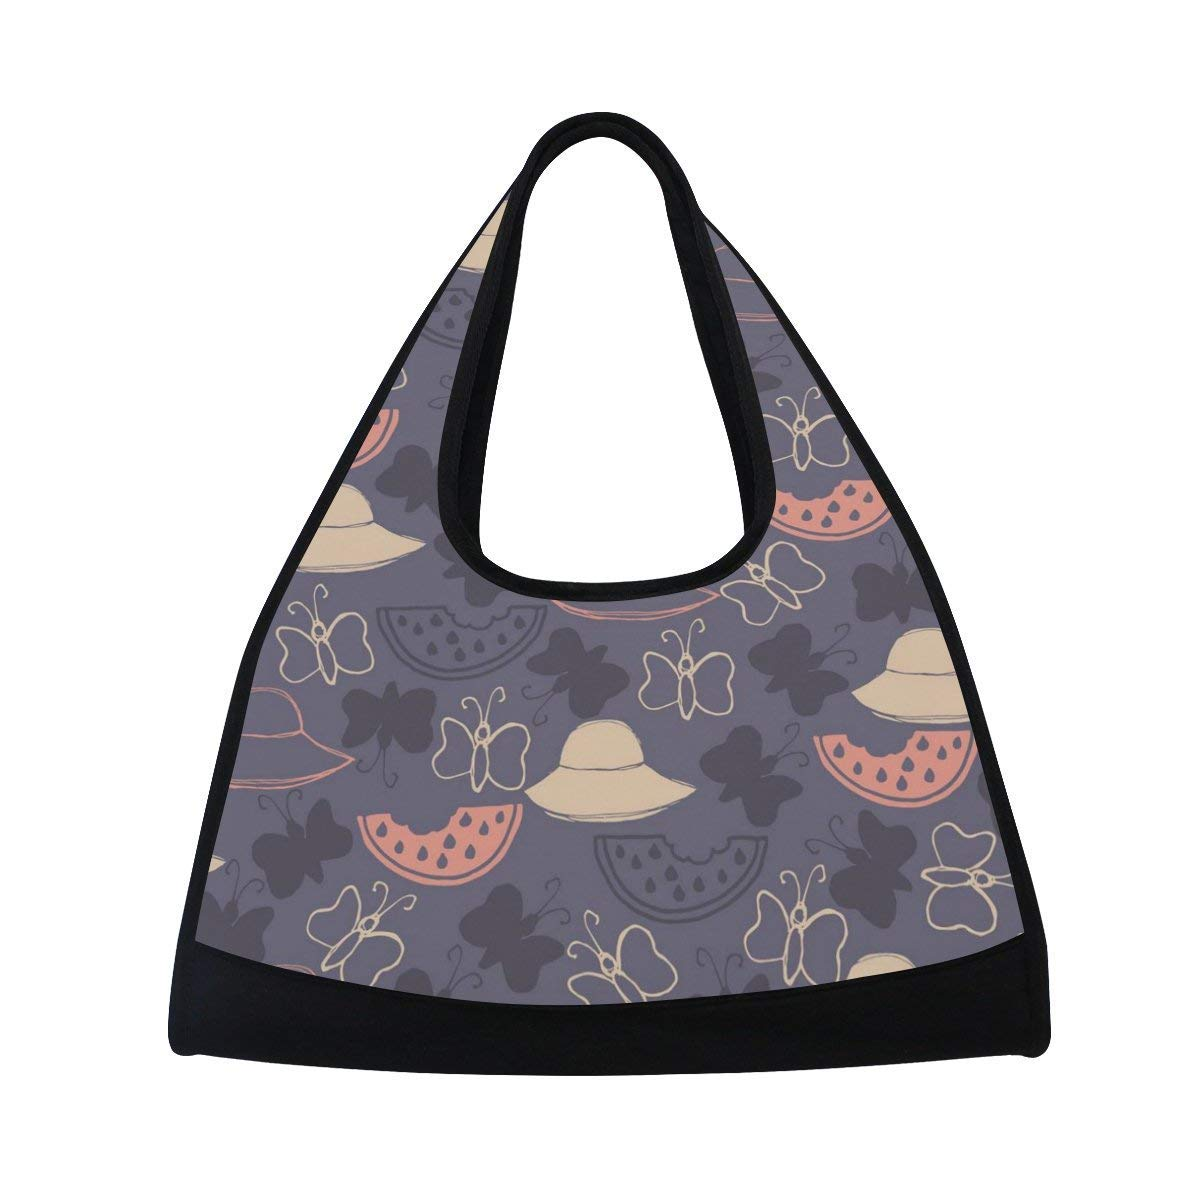 OuLian Sport Gym Bag Butterfly Pattern Canvas Travel Duffel Bag